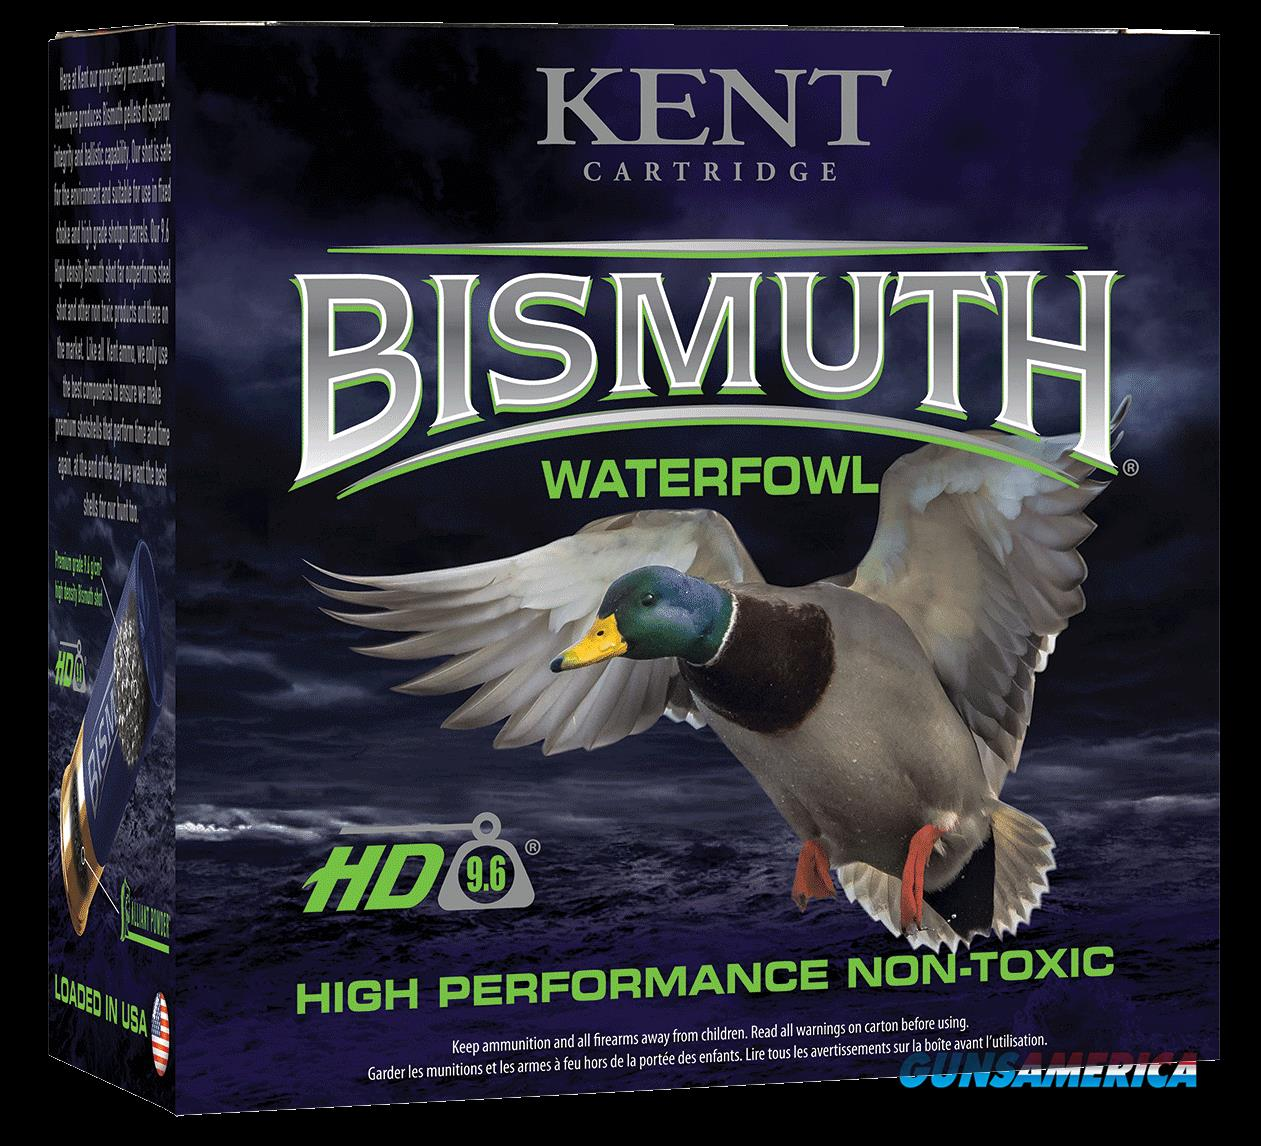 Kent Cartridge Bismuth, Kent B12w364    2.75  11-4 Bismt Waterfowl   25-10  Guns > Pistols > 1911 Pistol Copies (non-Colt)